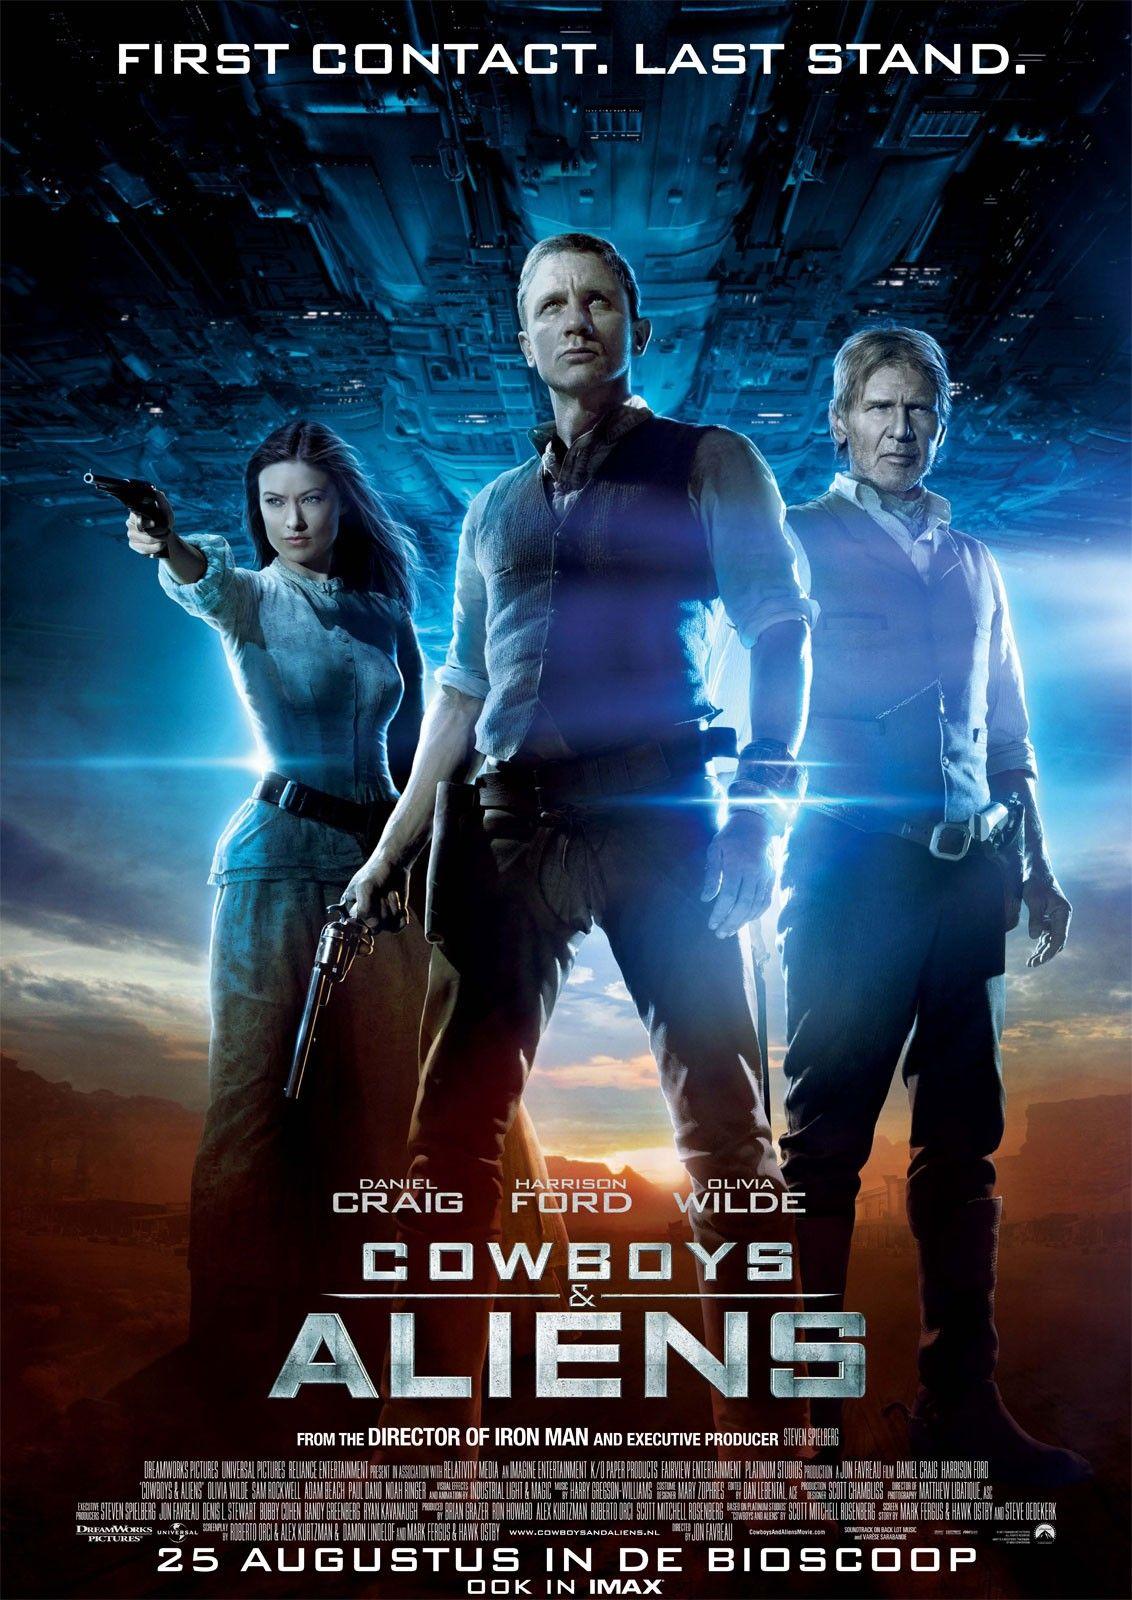 Cowboy and Aliens 2011 Alien movie poster, Aliens